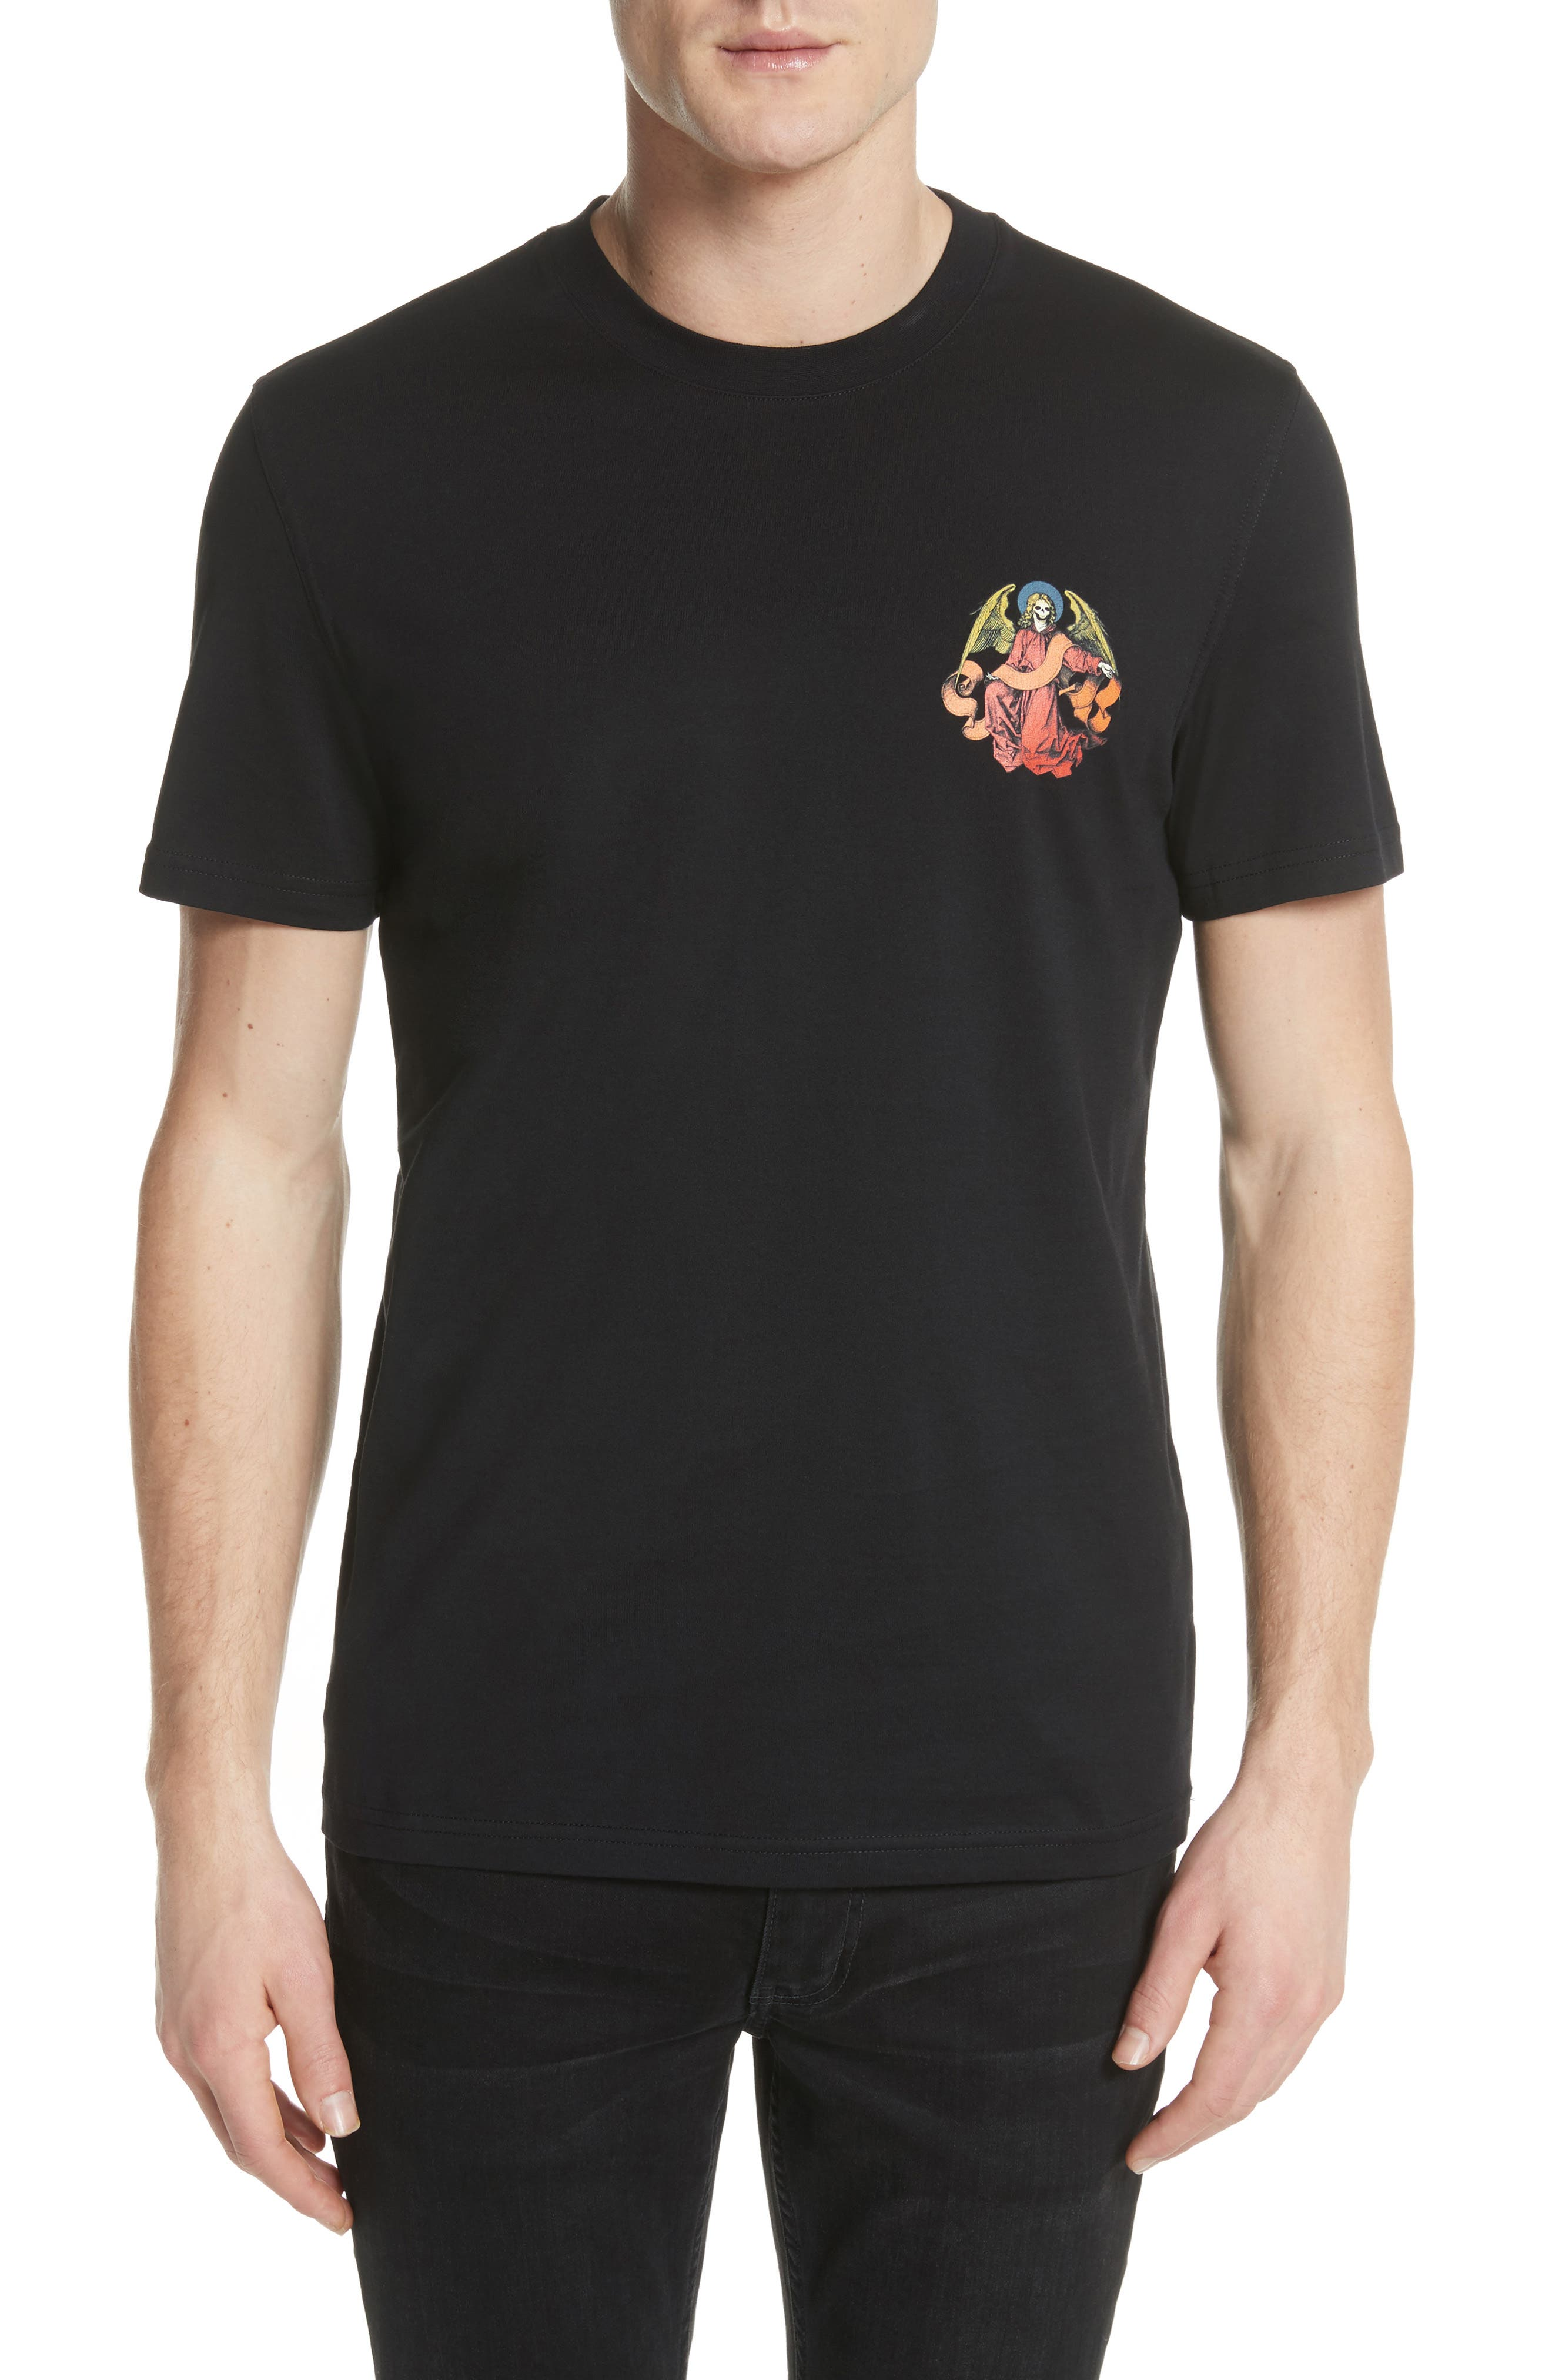 Givenchy Underworld Graphic T-Shirt